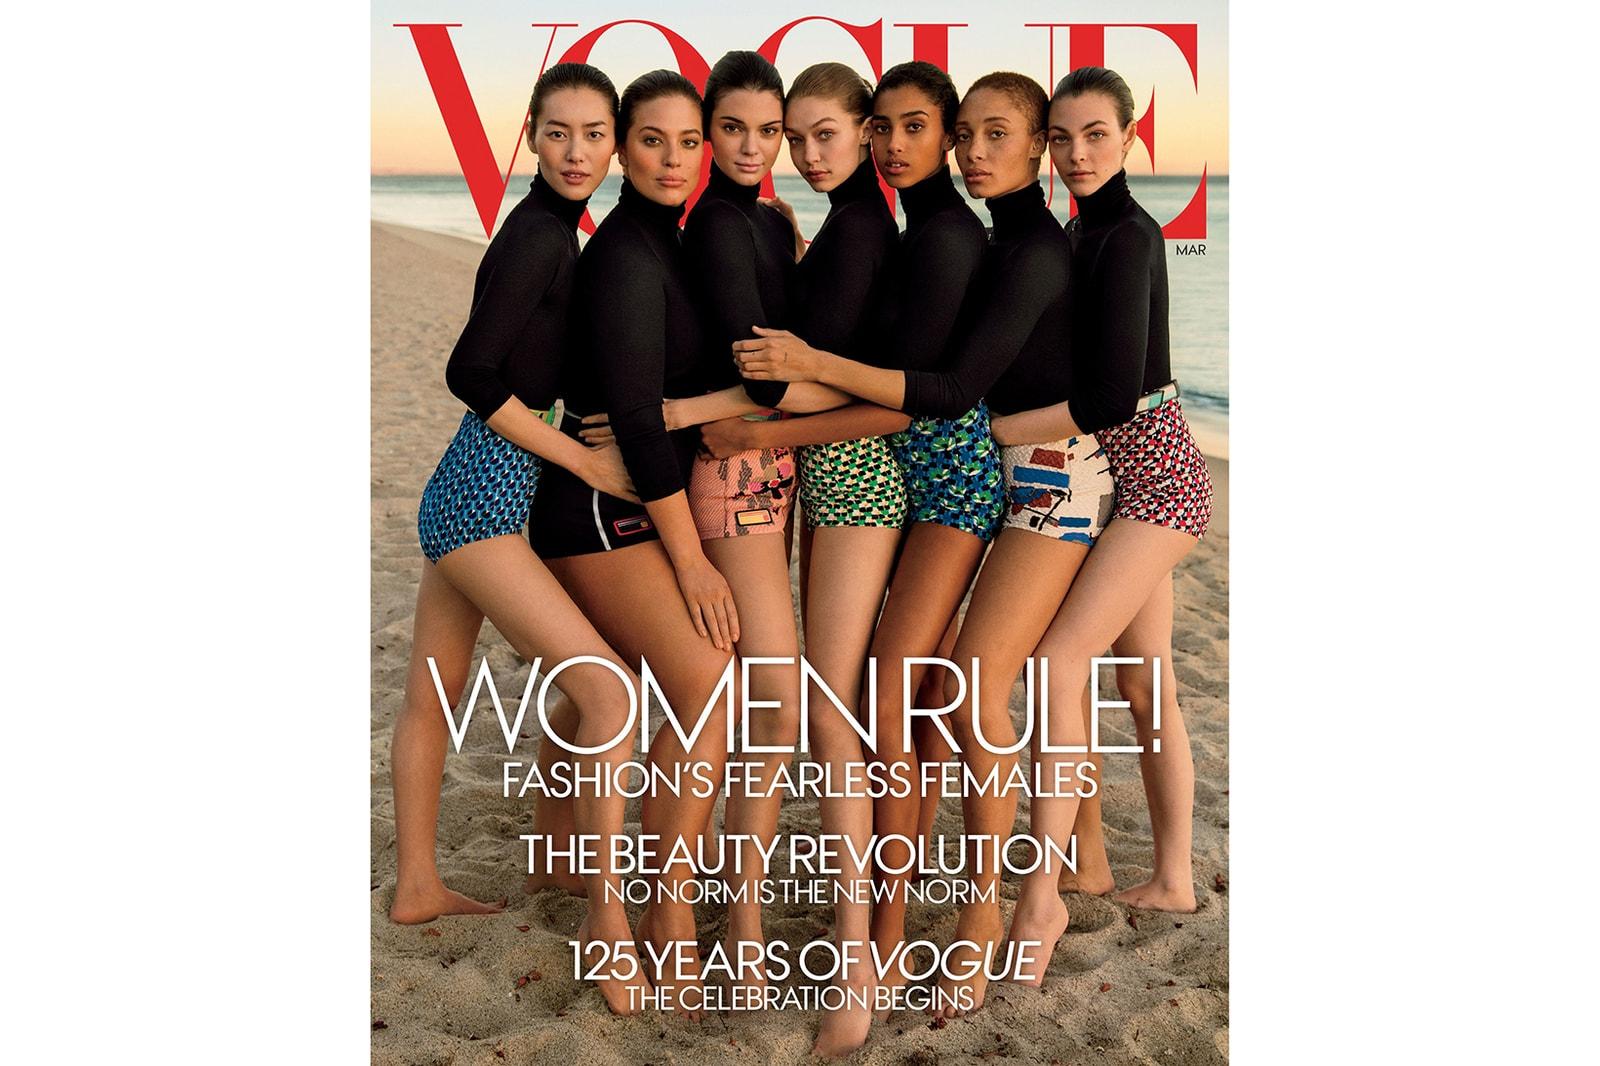 Ashley Graham Kendall Jenner Gigi Hadid Vogue 2017 March Cover